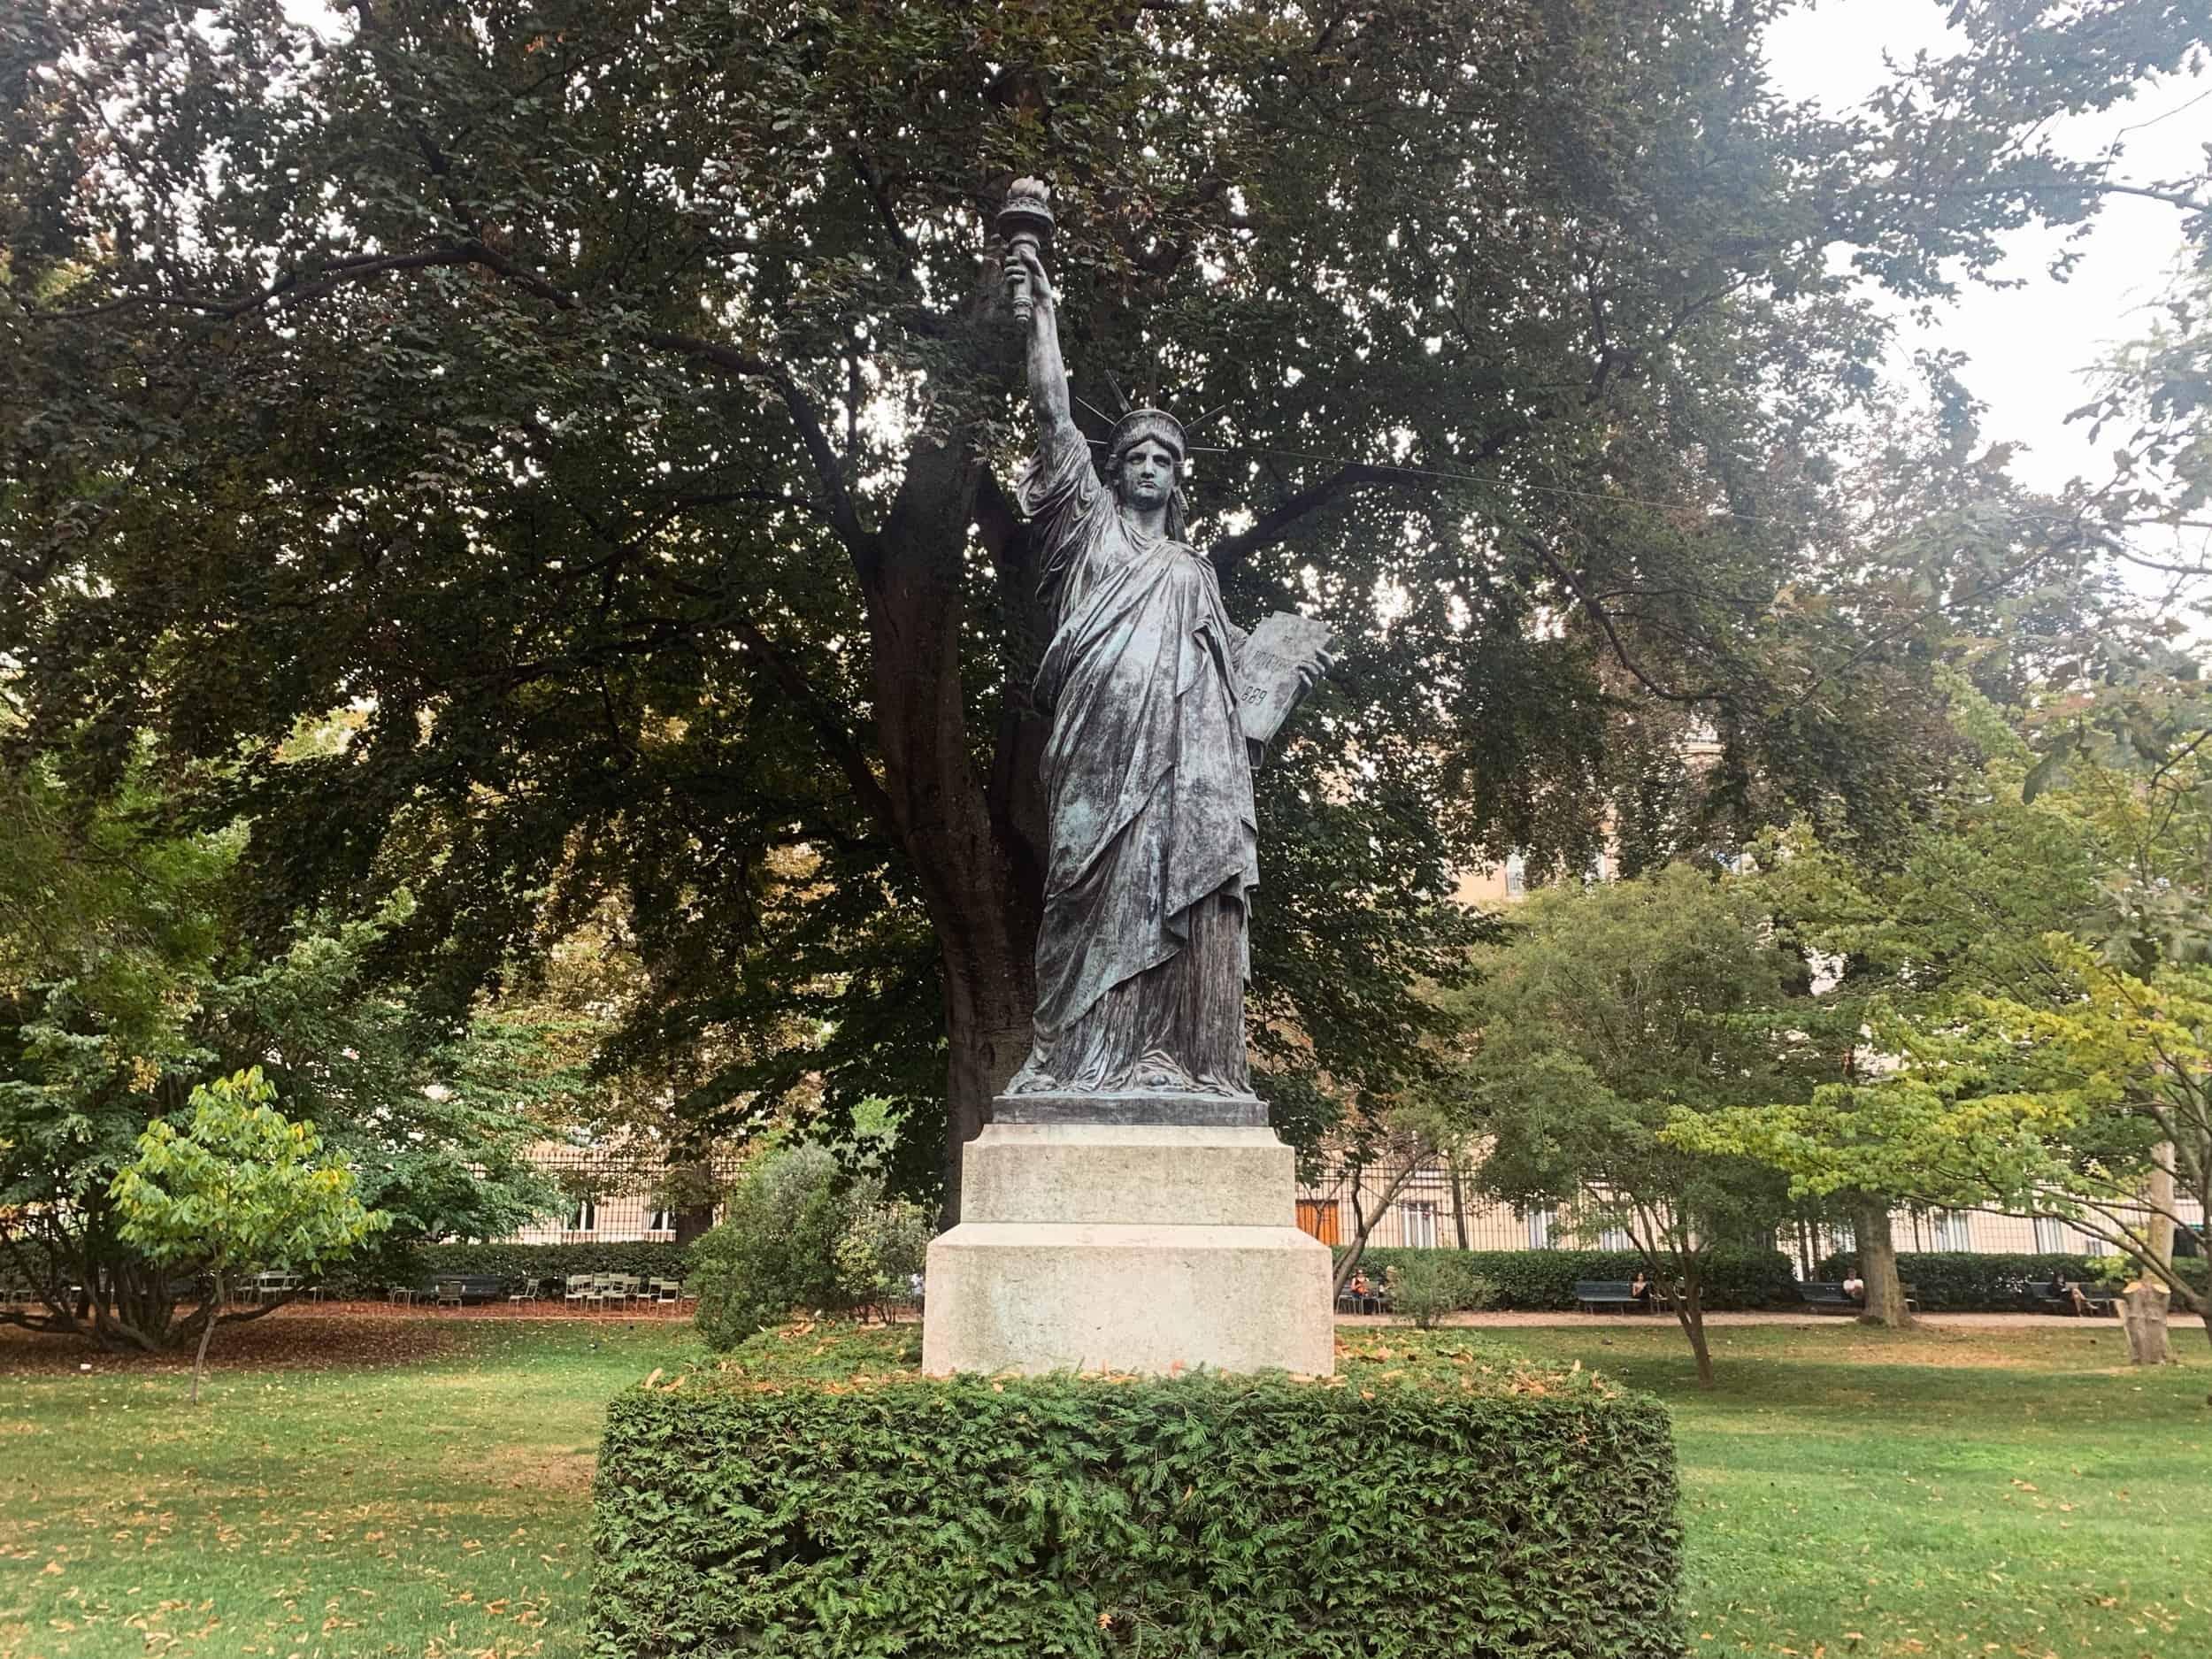 Jardin du Luxembourg Statue of Liberty